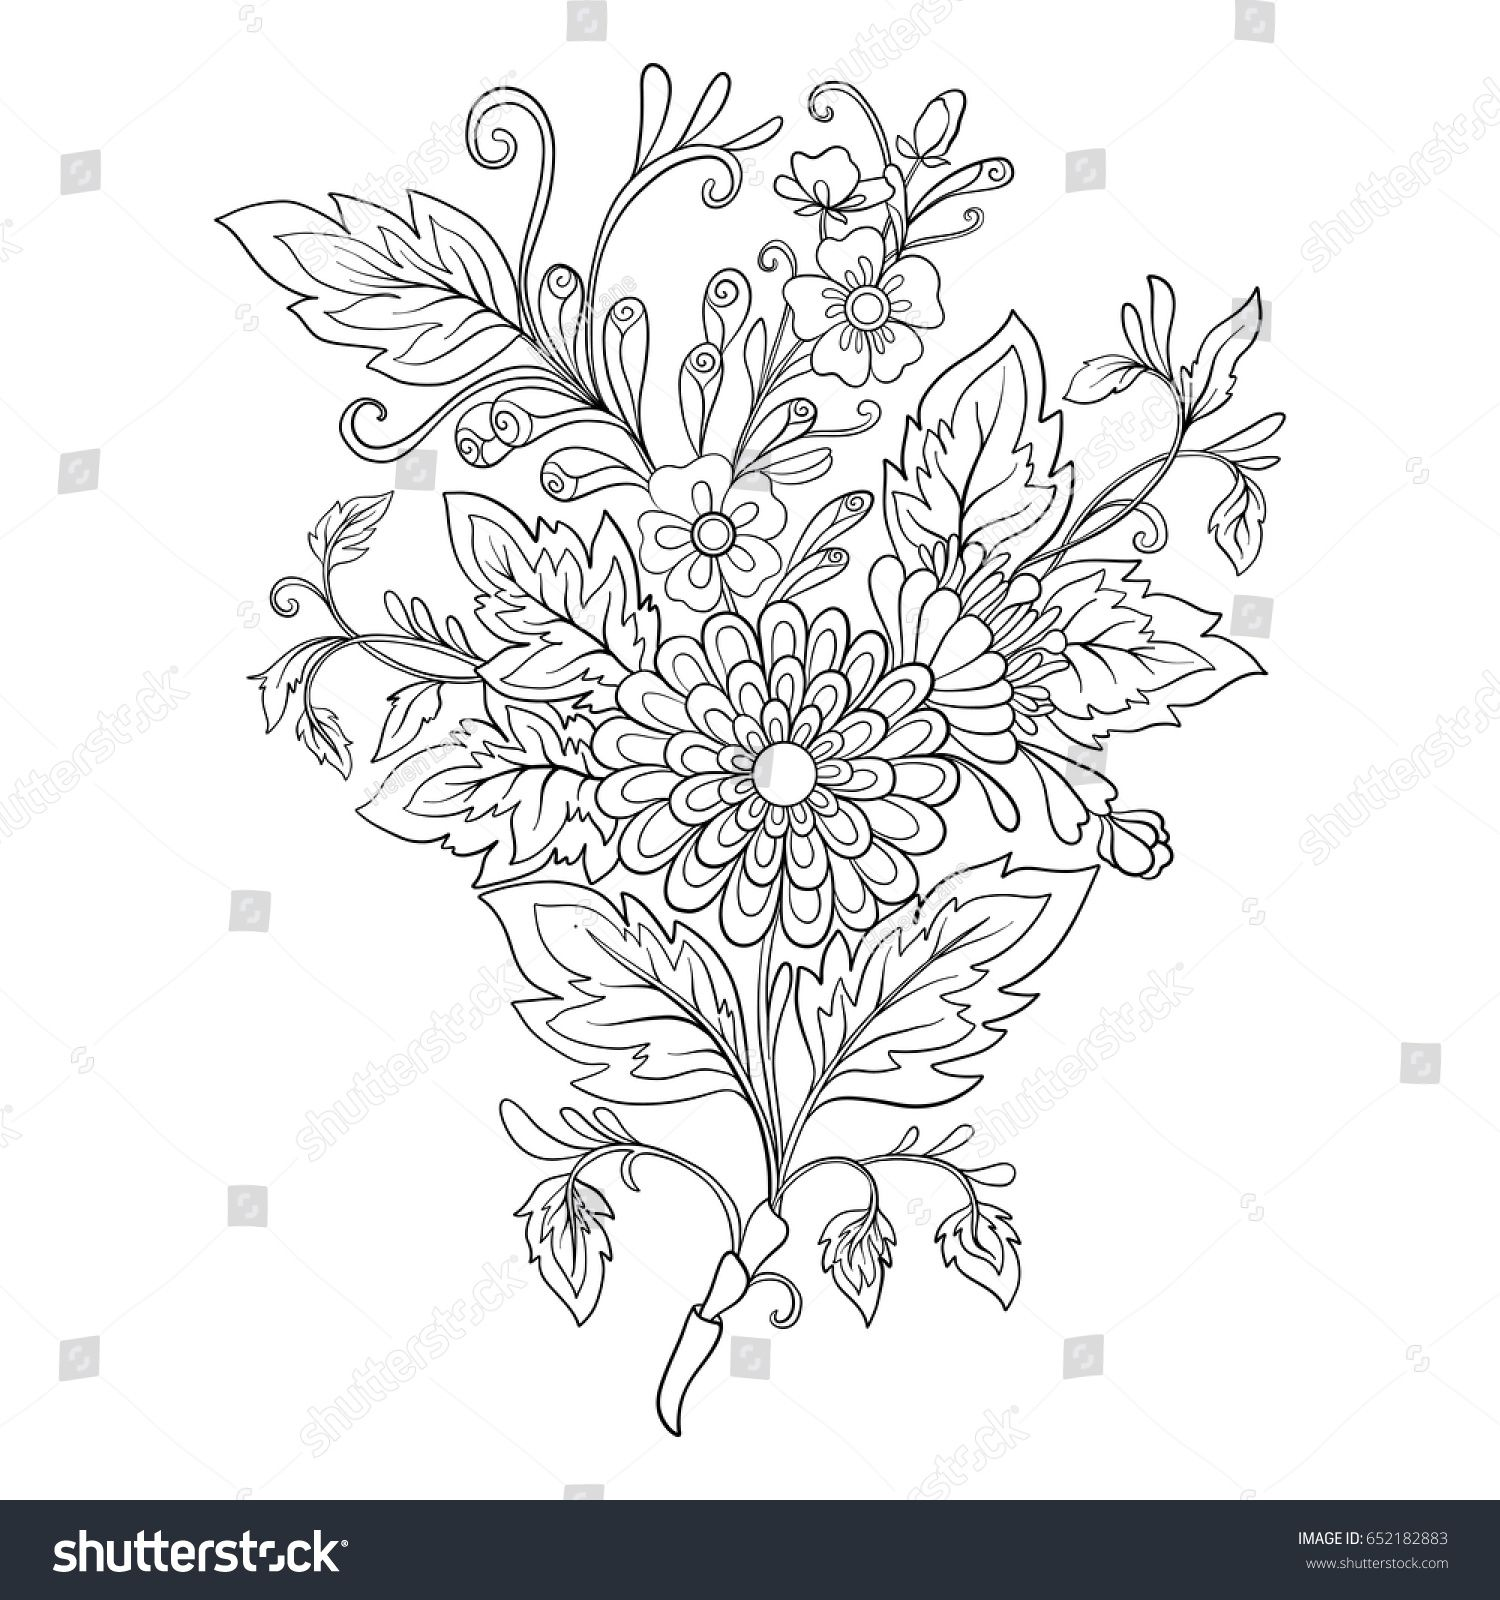 Outline vintage flowers bouquet or pattern embroidery patterns outline vintage flowers bouquet or pattern izmirmasajfo